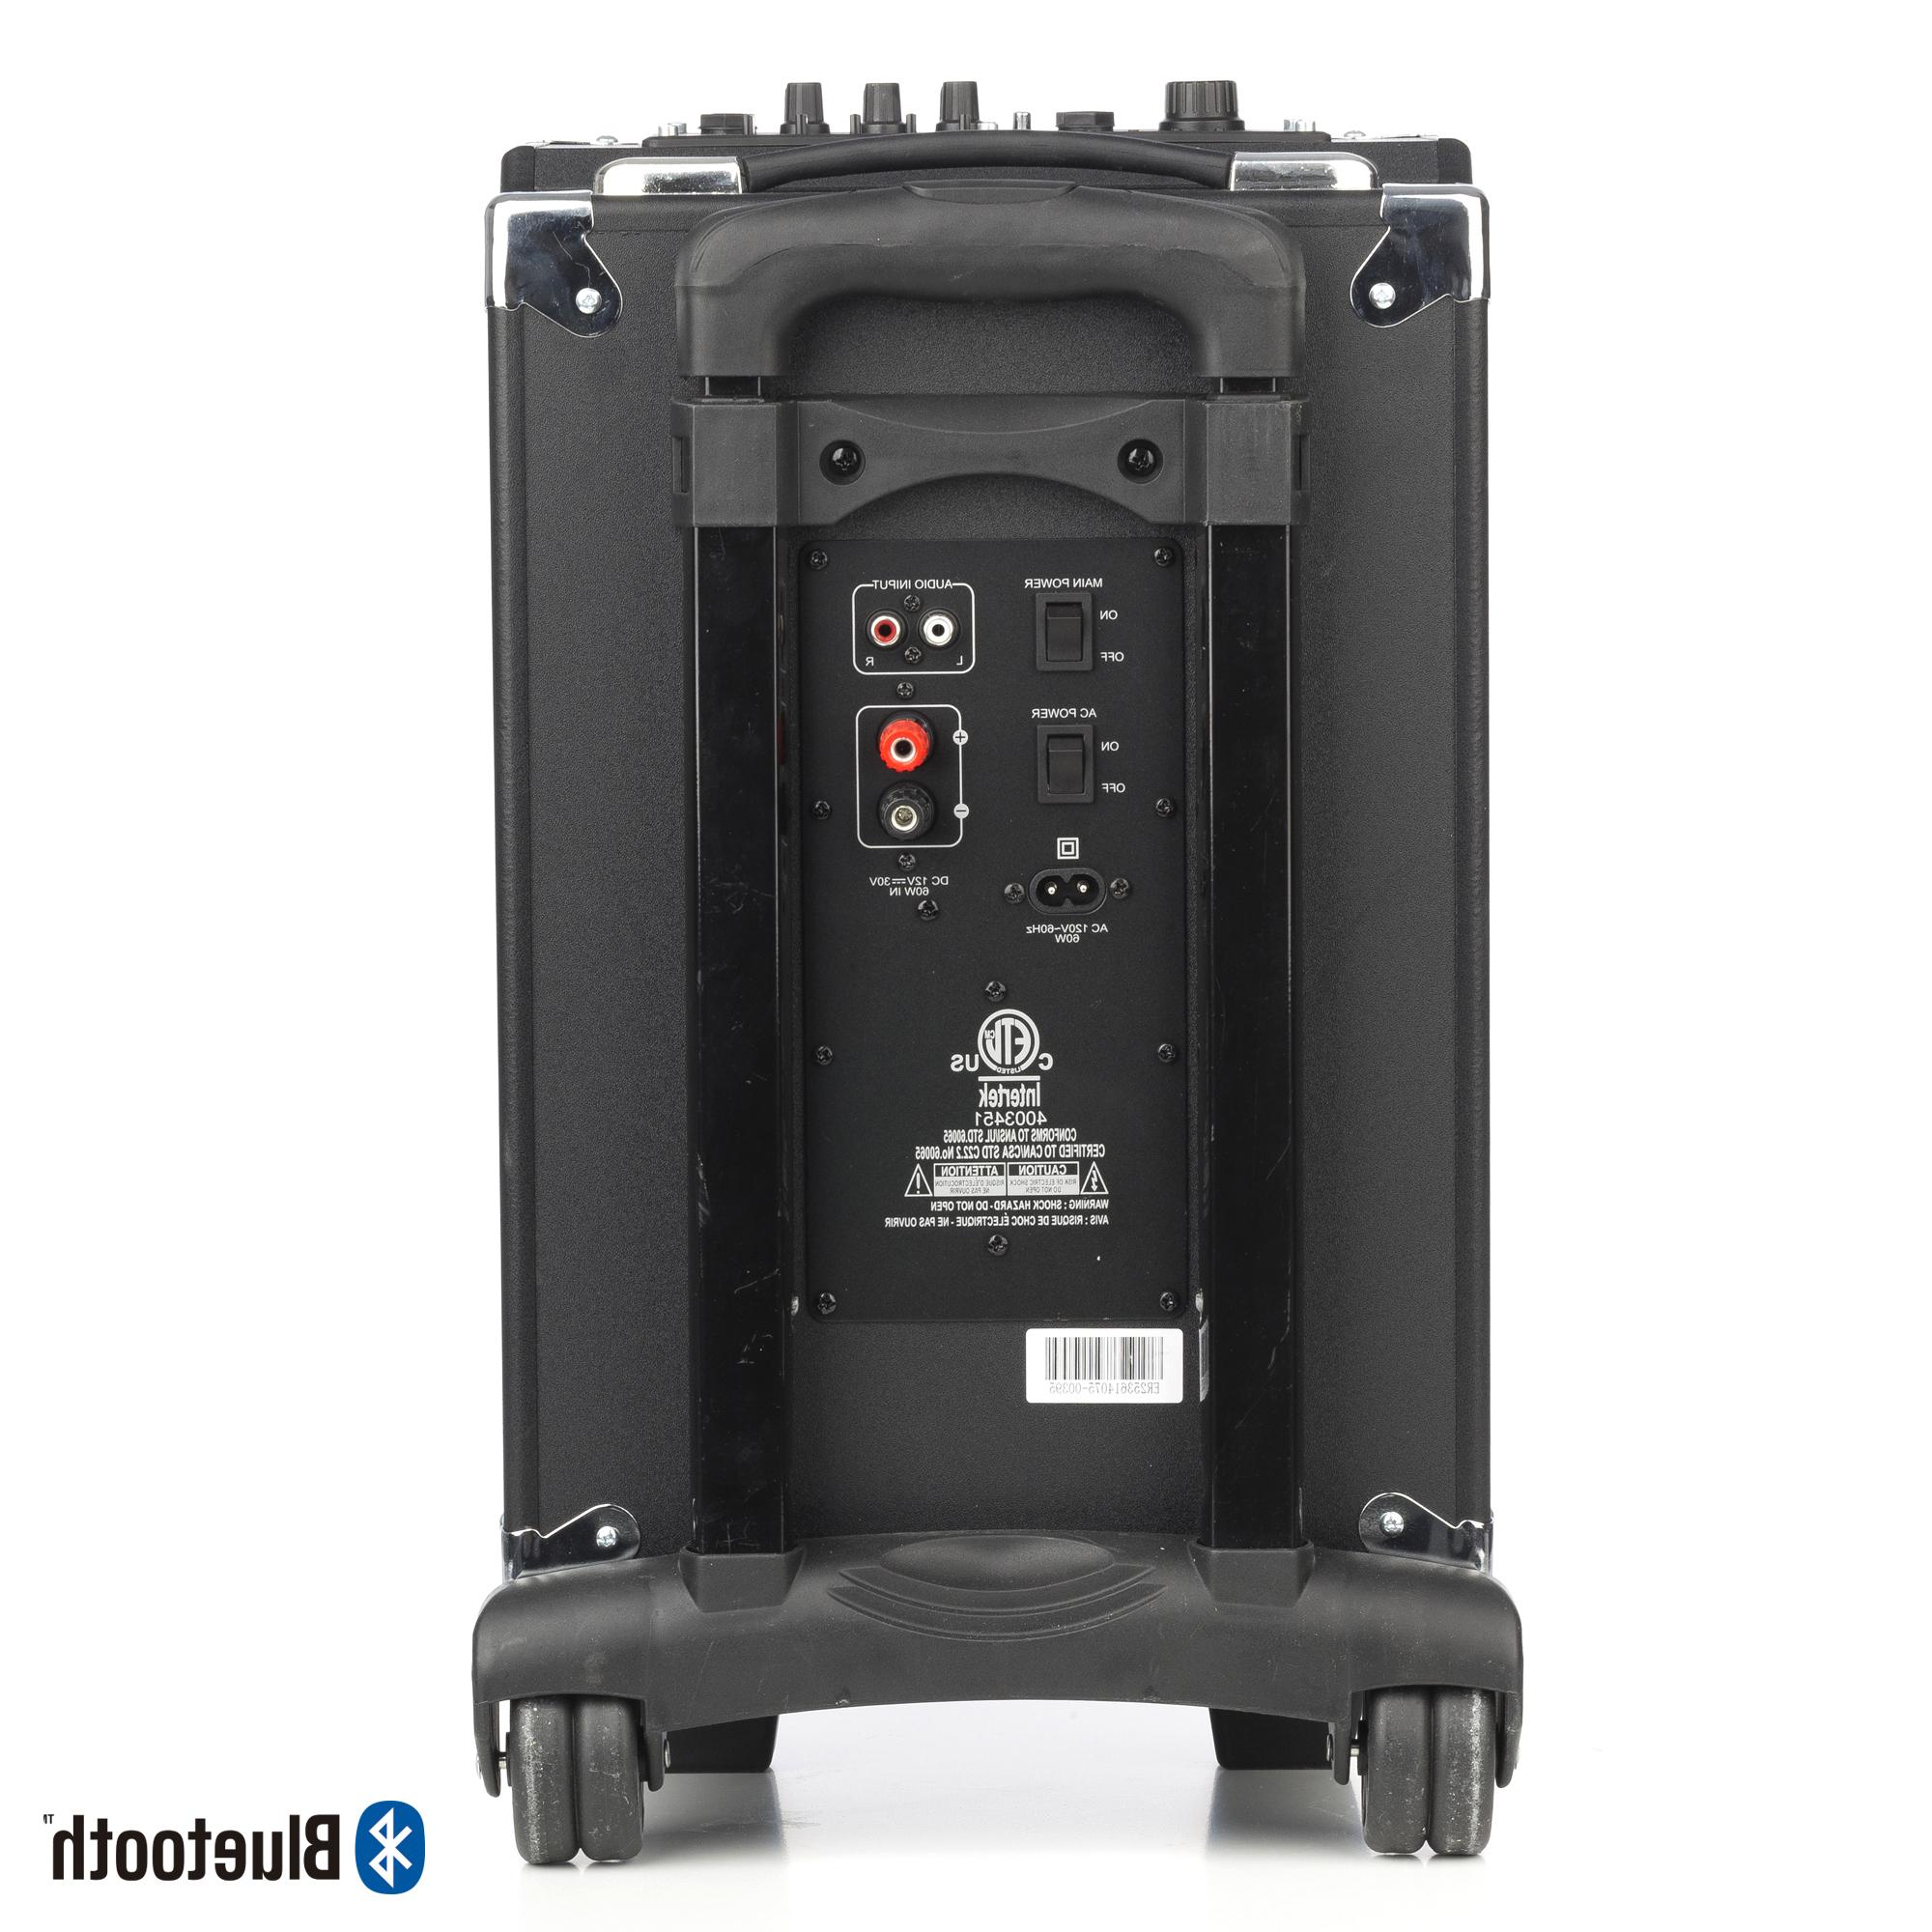 Altavoz Bluetooth Portatil Potente Ftd8 Altavoz Bluetooth Portatil 40w 2200mah V2 1 Entrada Micro Usb Aux